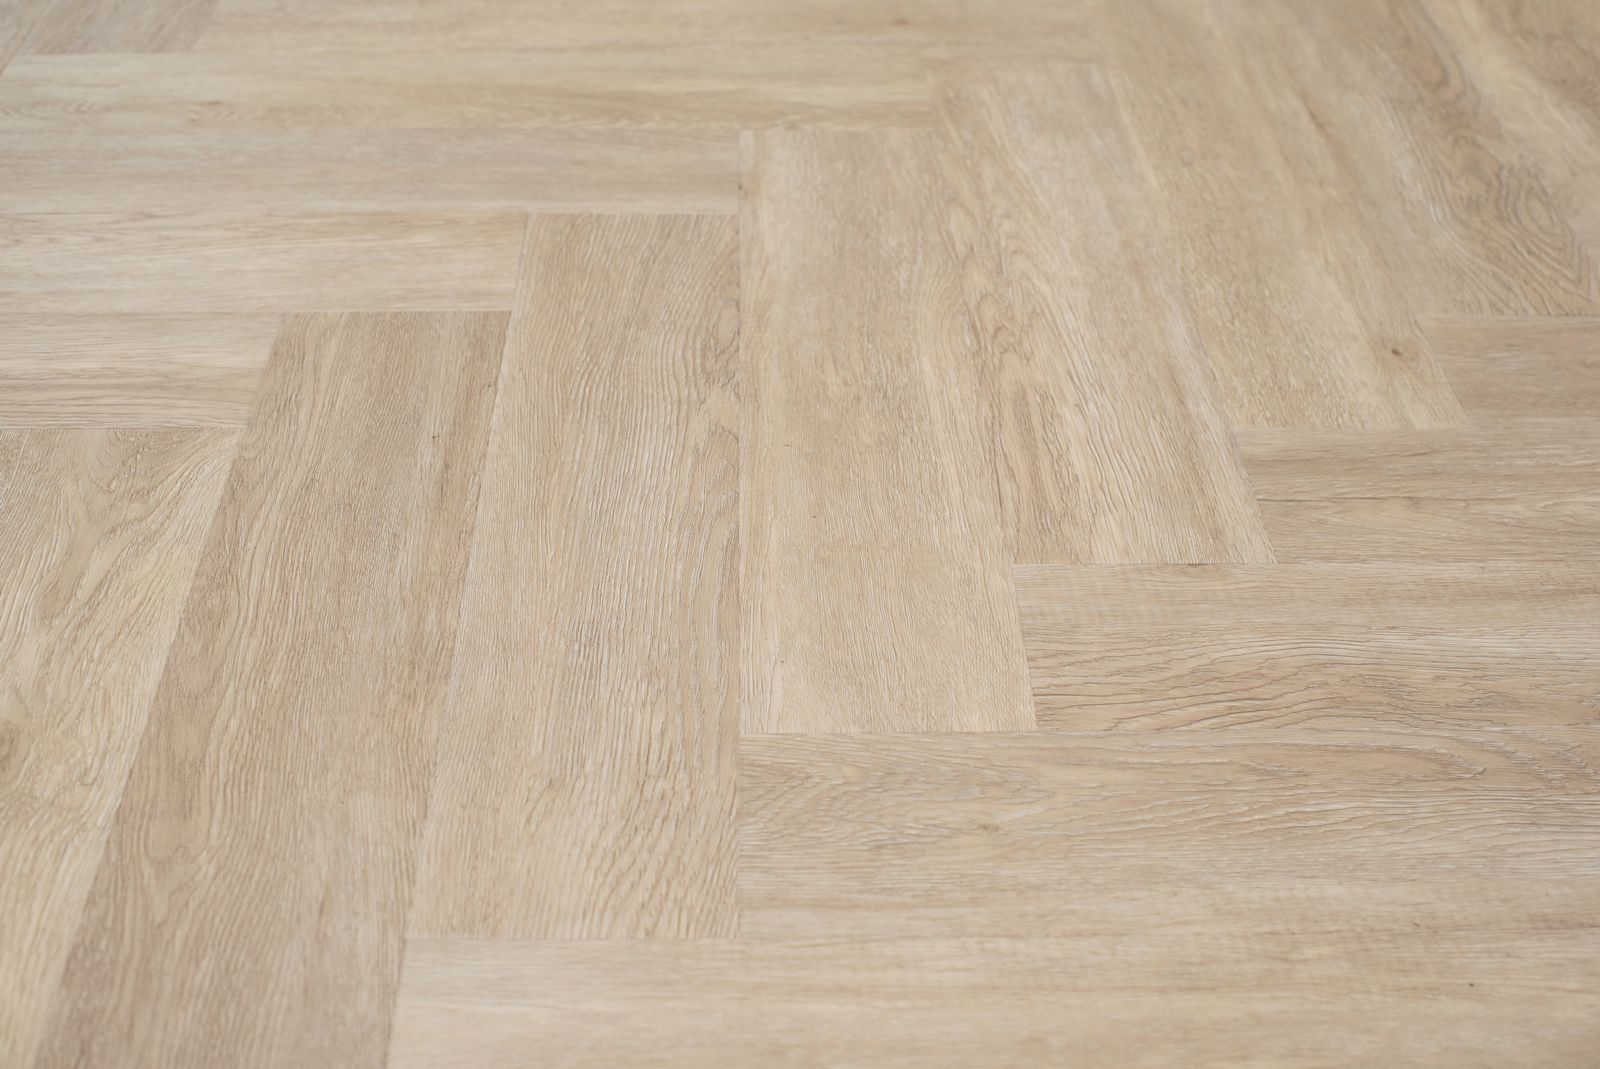 Test Pvc Vloeren : Floer visgraat pvc vloeren crèmewit eiken cm witte vloer